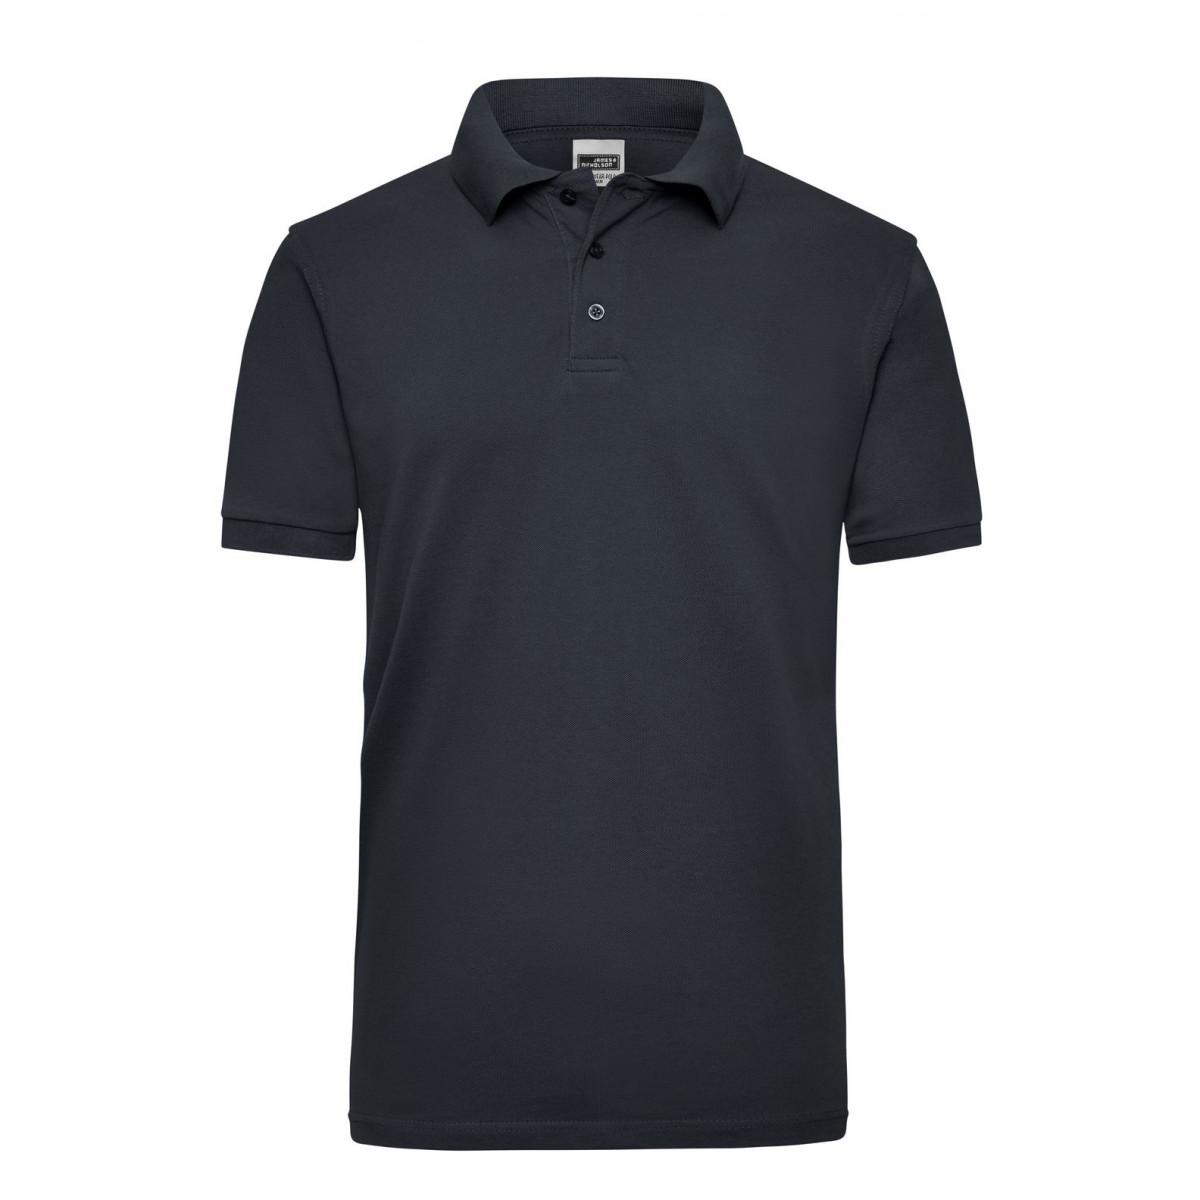 Рубашка поло мужская JN801 Workwear Polo Men - Карбон